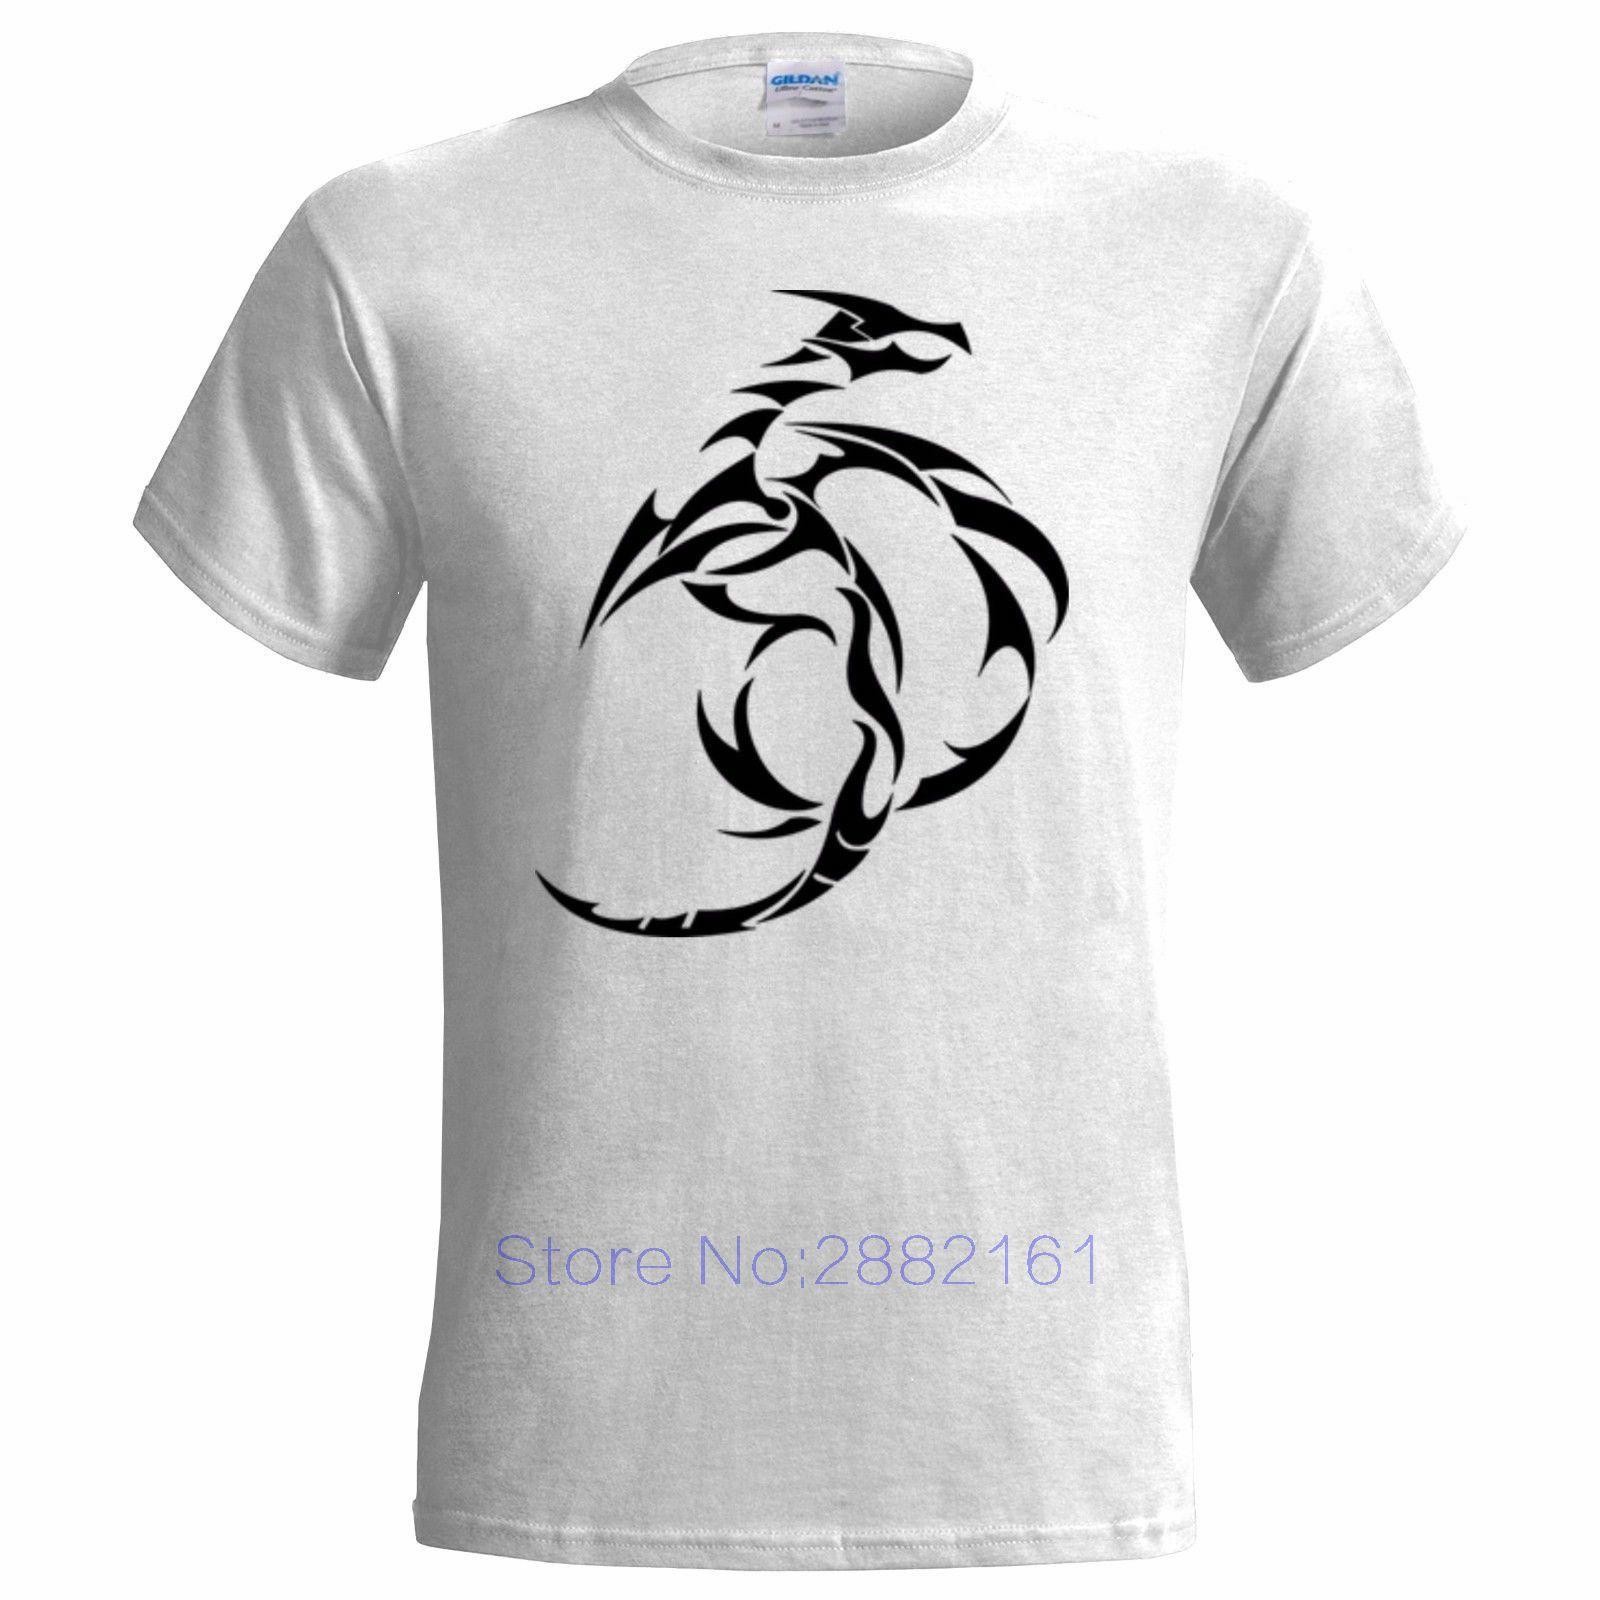 c51bfedfb TRIBAL DRAGON 2 ART DESIGN MENS T SHIRT MAORI TATTOO STYLE CHINESE STRENGTH  Men O Neck Tee Shirt And T Shirt T Shirt Makes From Beidhgate03, $11.01|  DHgate.